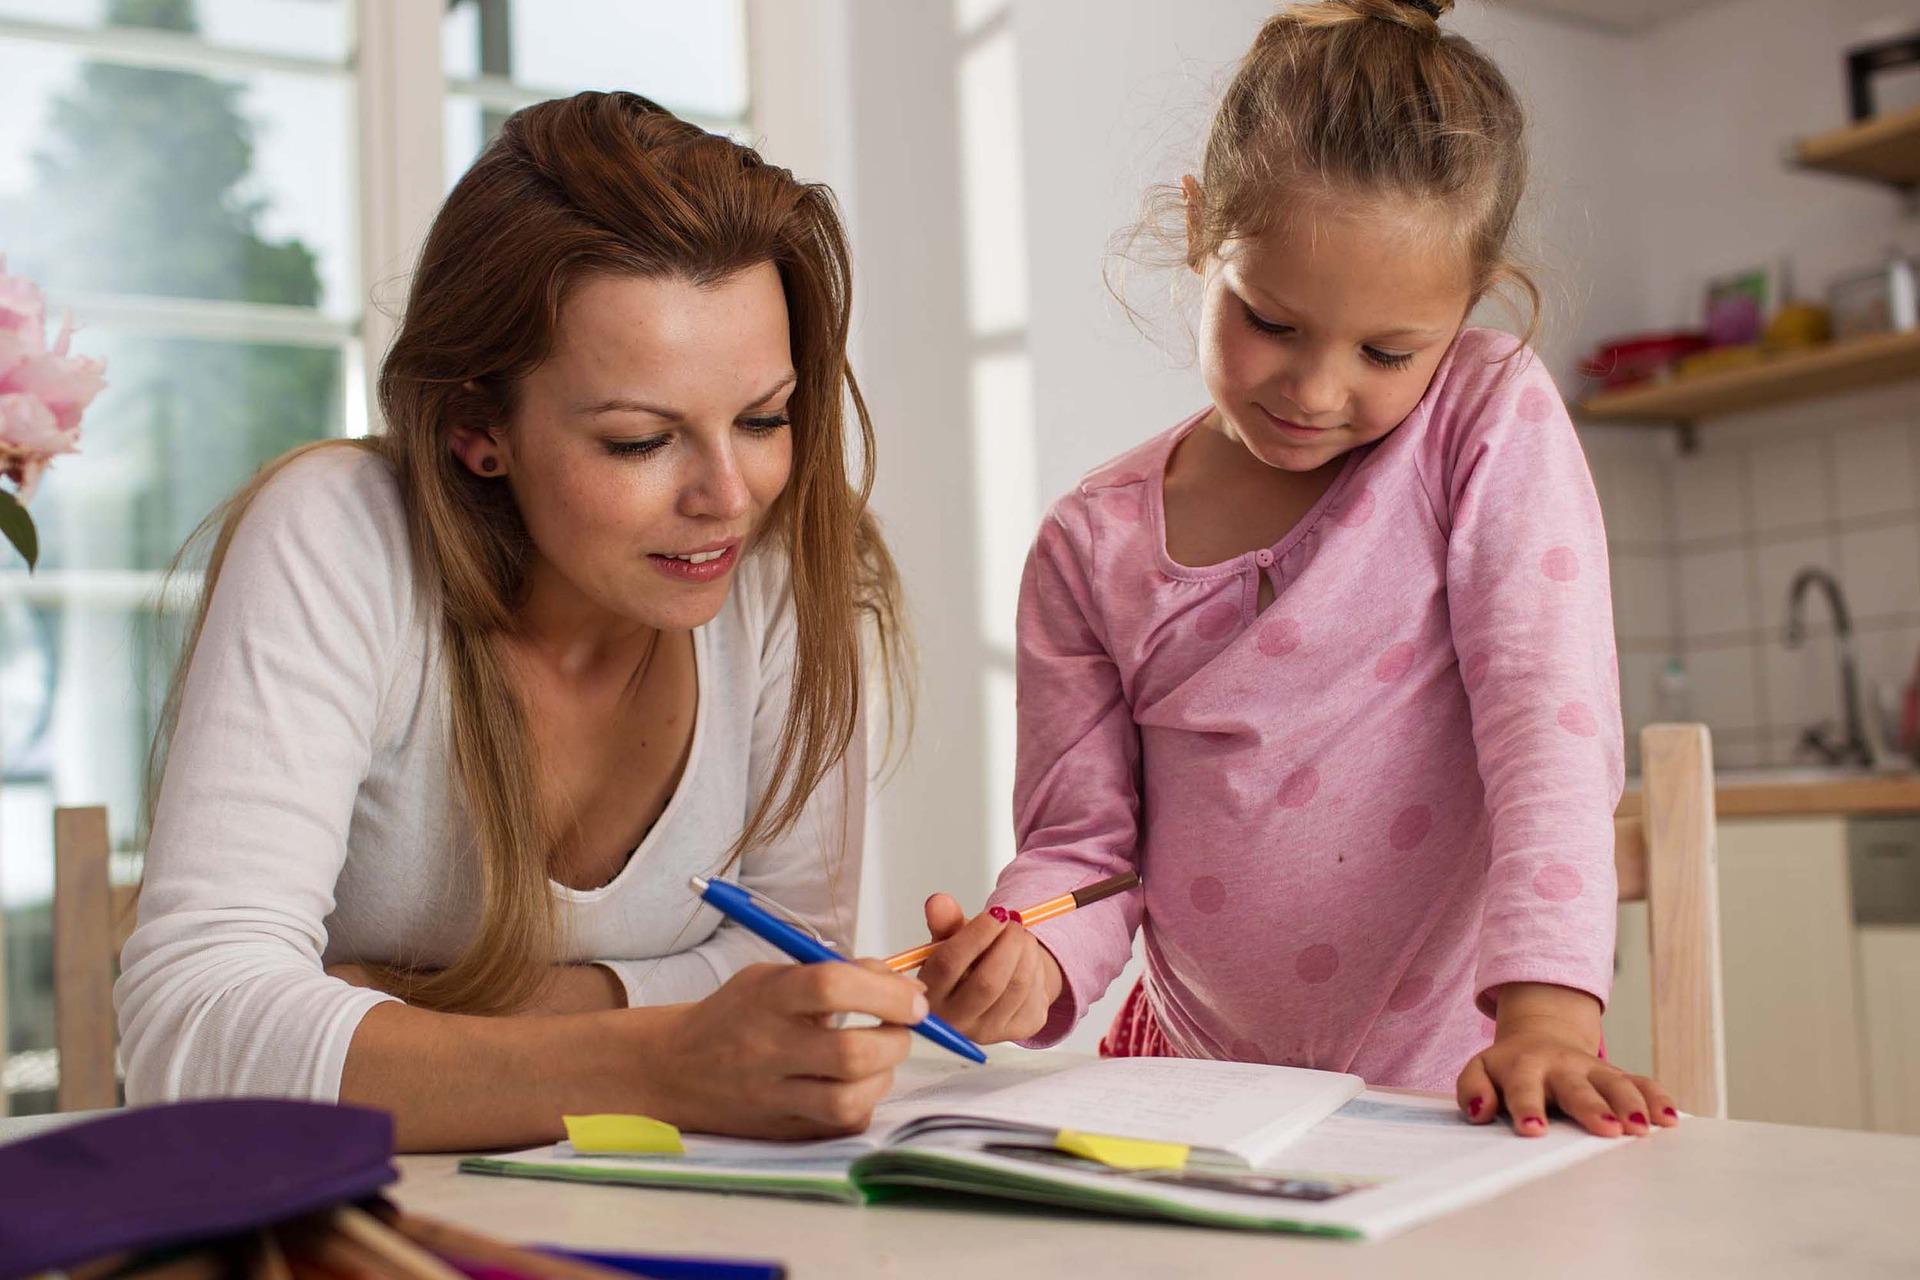 woman doing school work with kids